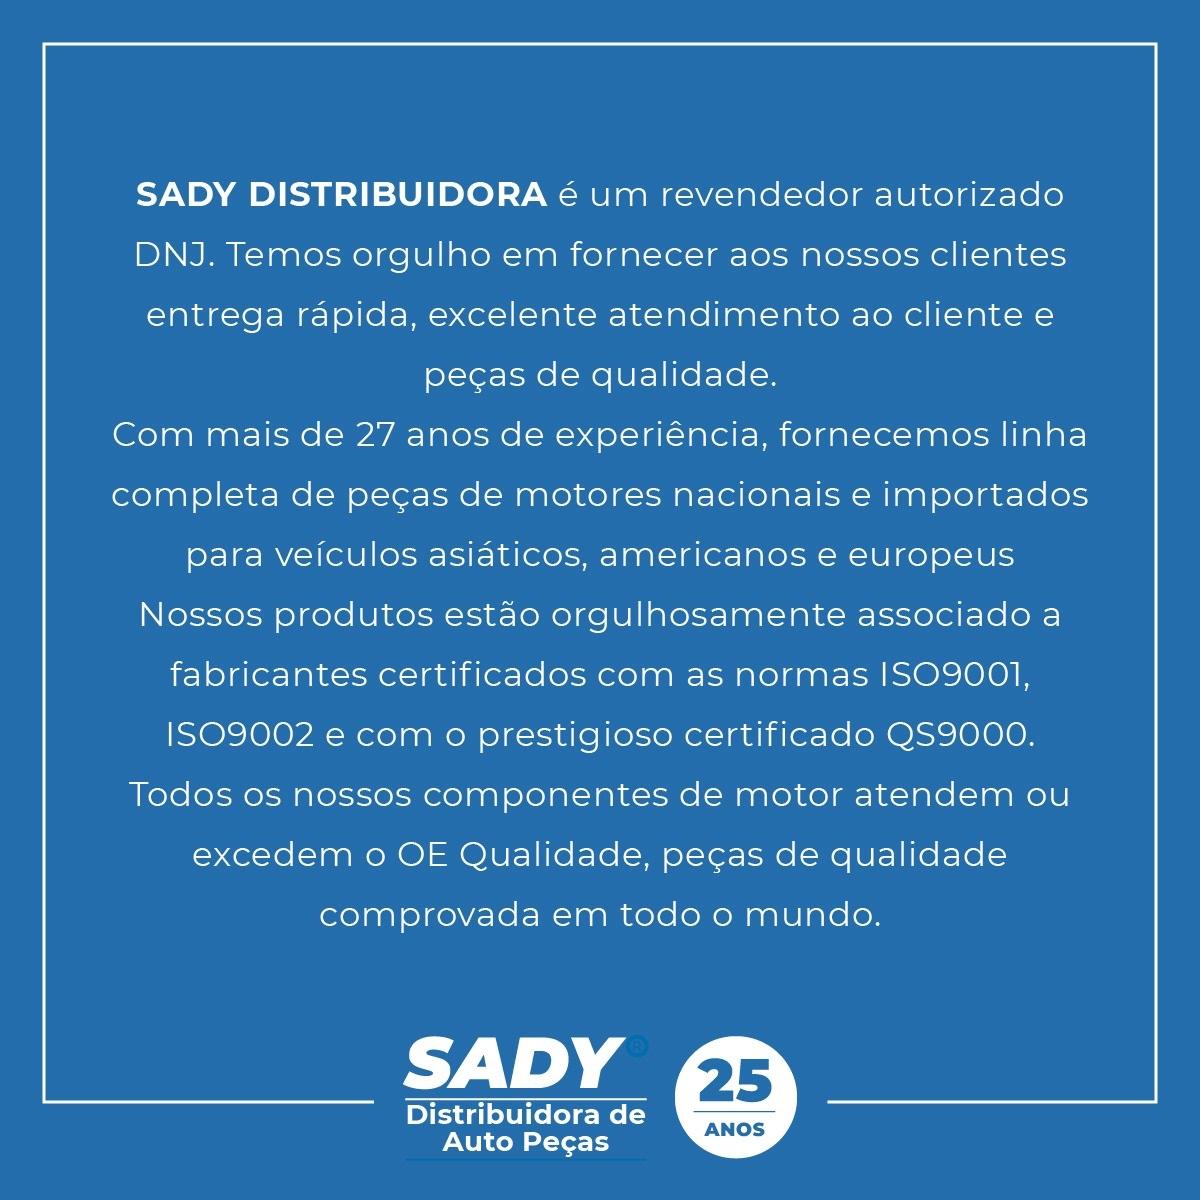 BOMBA DE OLEO DO MOTOR NISSAN 2.5 16V YD25